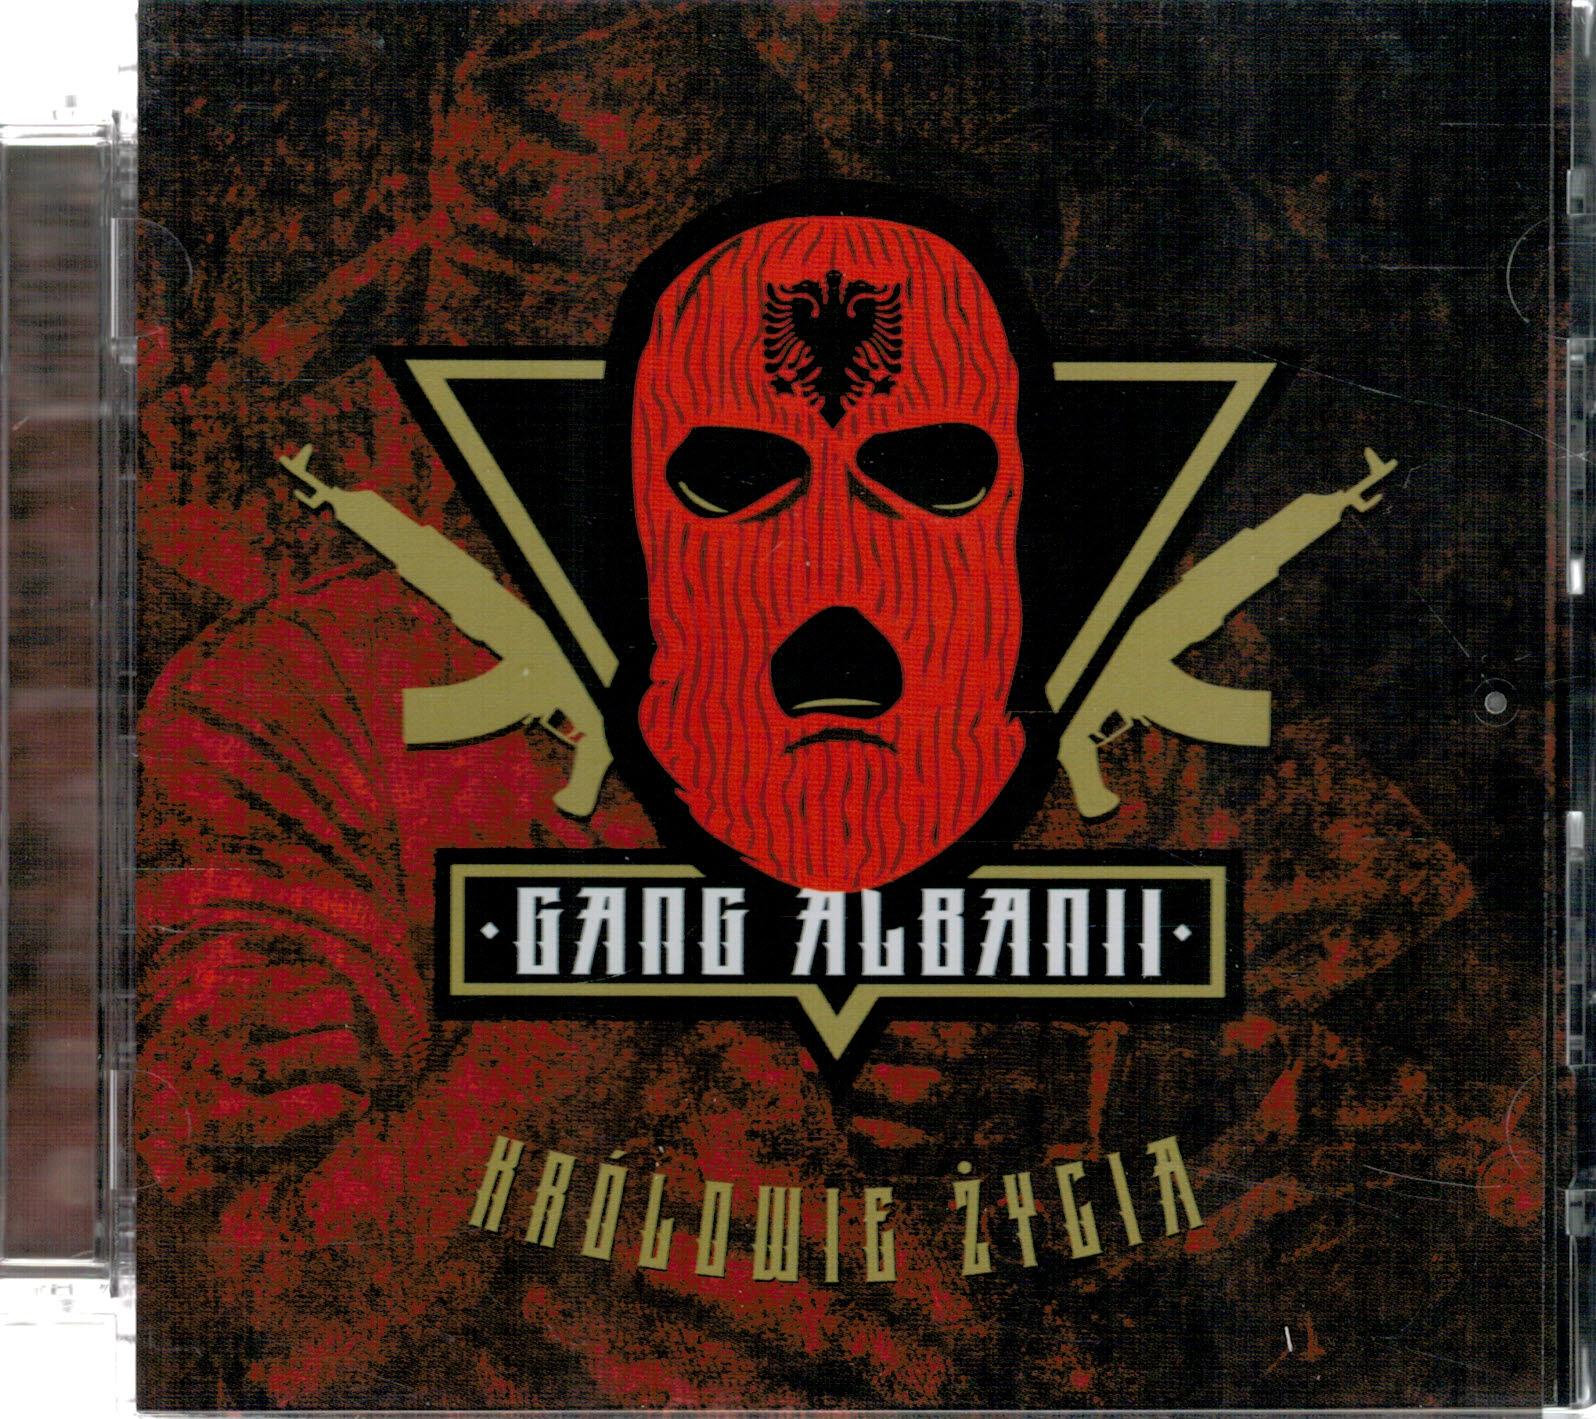 84790e64241b GANG ALBANII - KRÓLOWIE ŻYCIA  CD  STEP RECORDS - 6862161763 ...